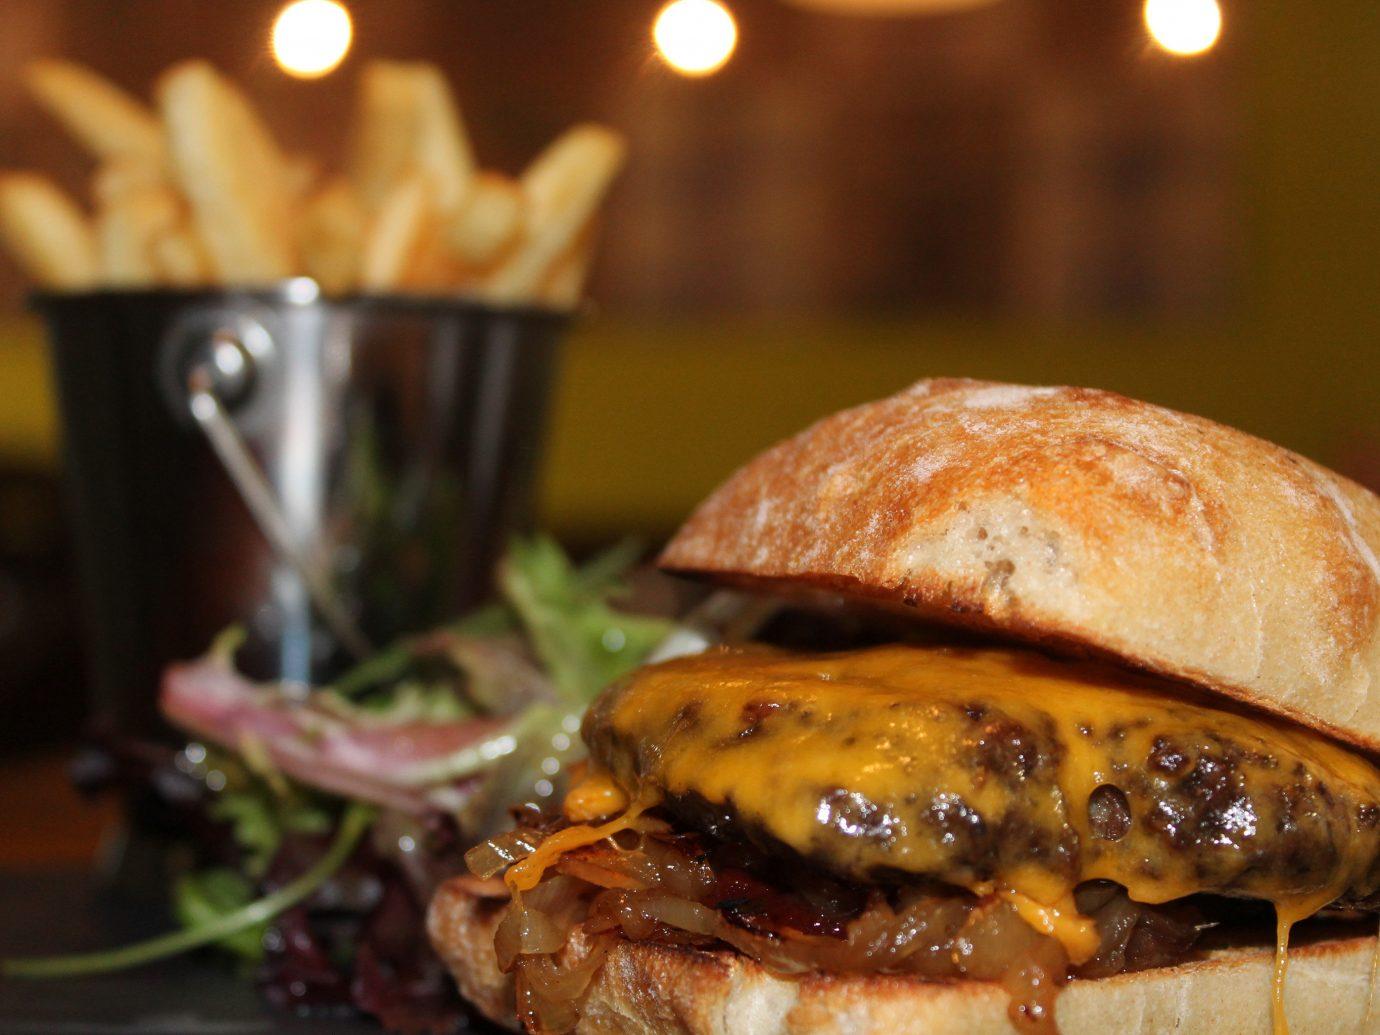 Food + Drink food indoor dish hamburger sandwich meal meat restaurant breakfast produce brunch cuisine snack food close